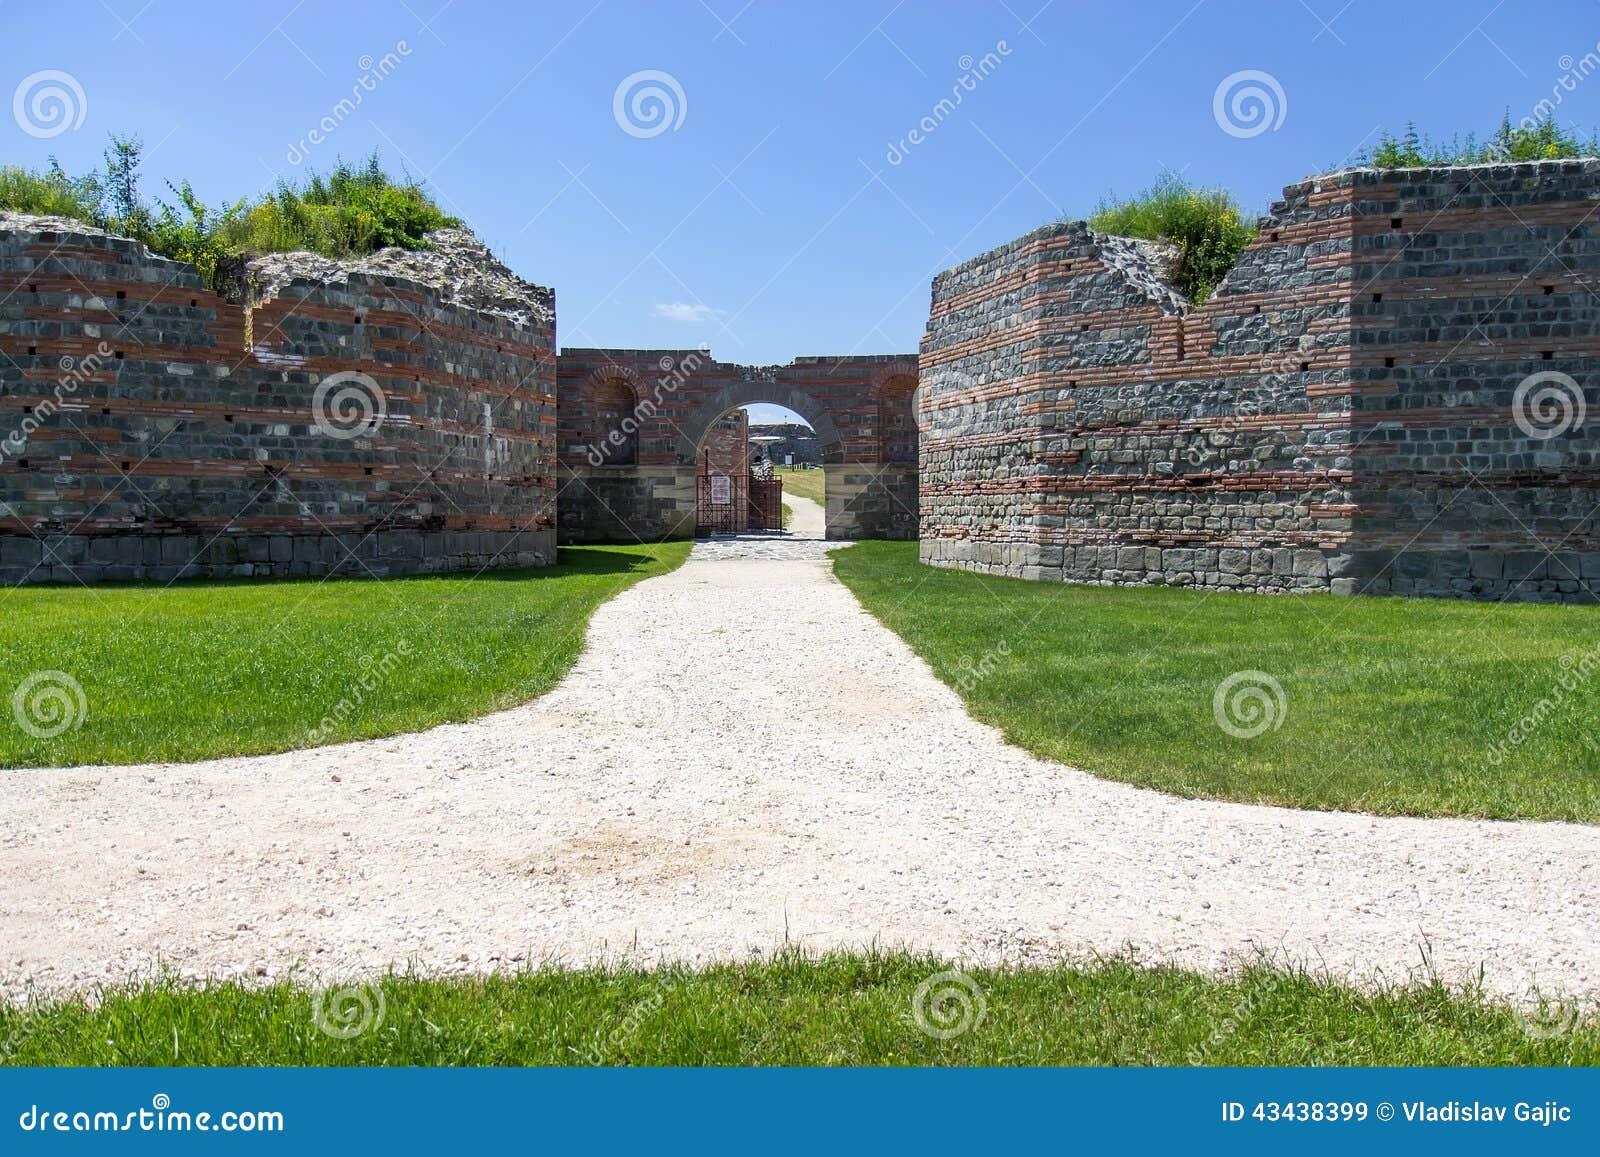 Roman archeological site, Gamzigrad